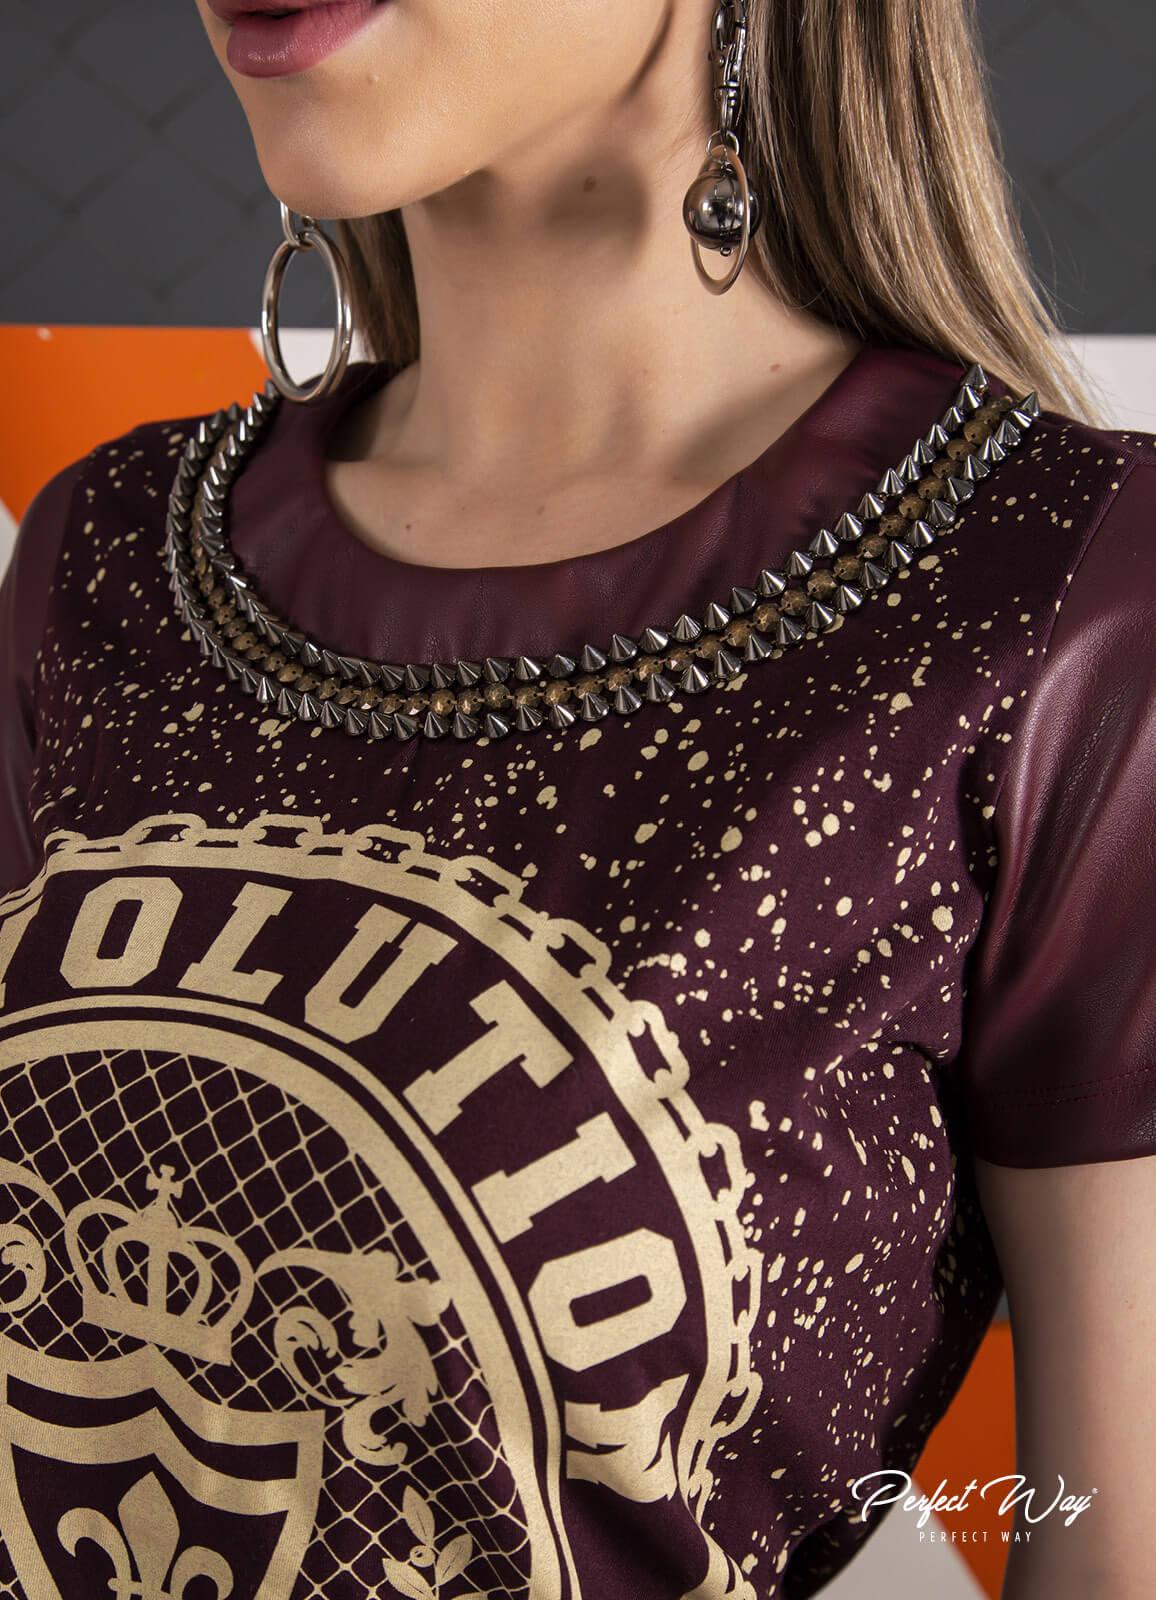 T SHIRT COM MANGA sintético + ESTAMPA EXCLUSIVA bordado  PERFECT WAY